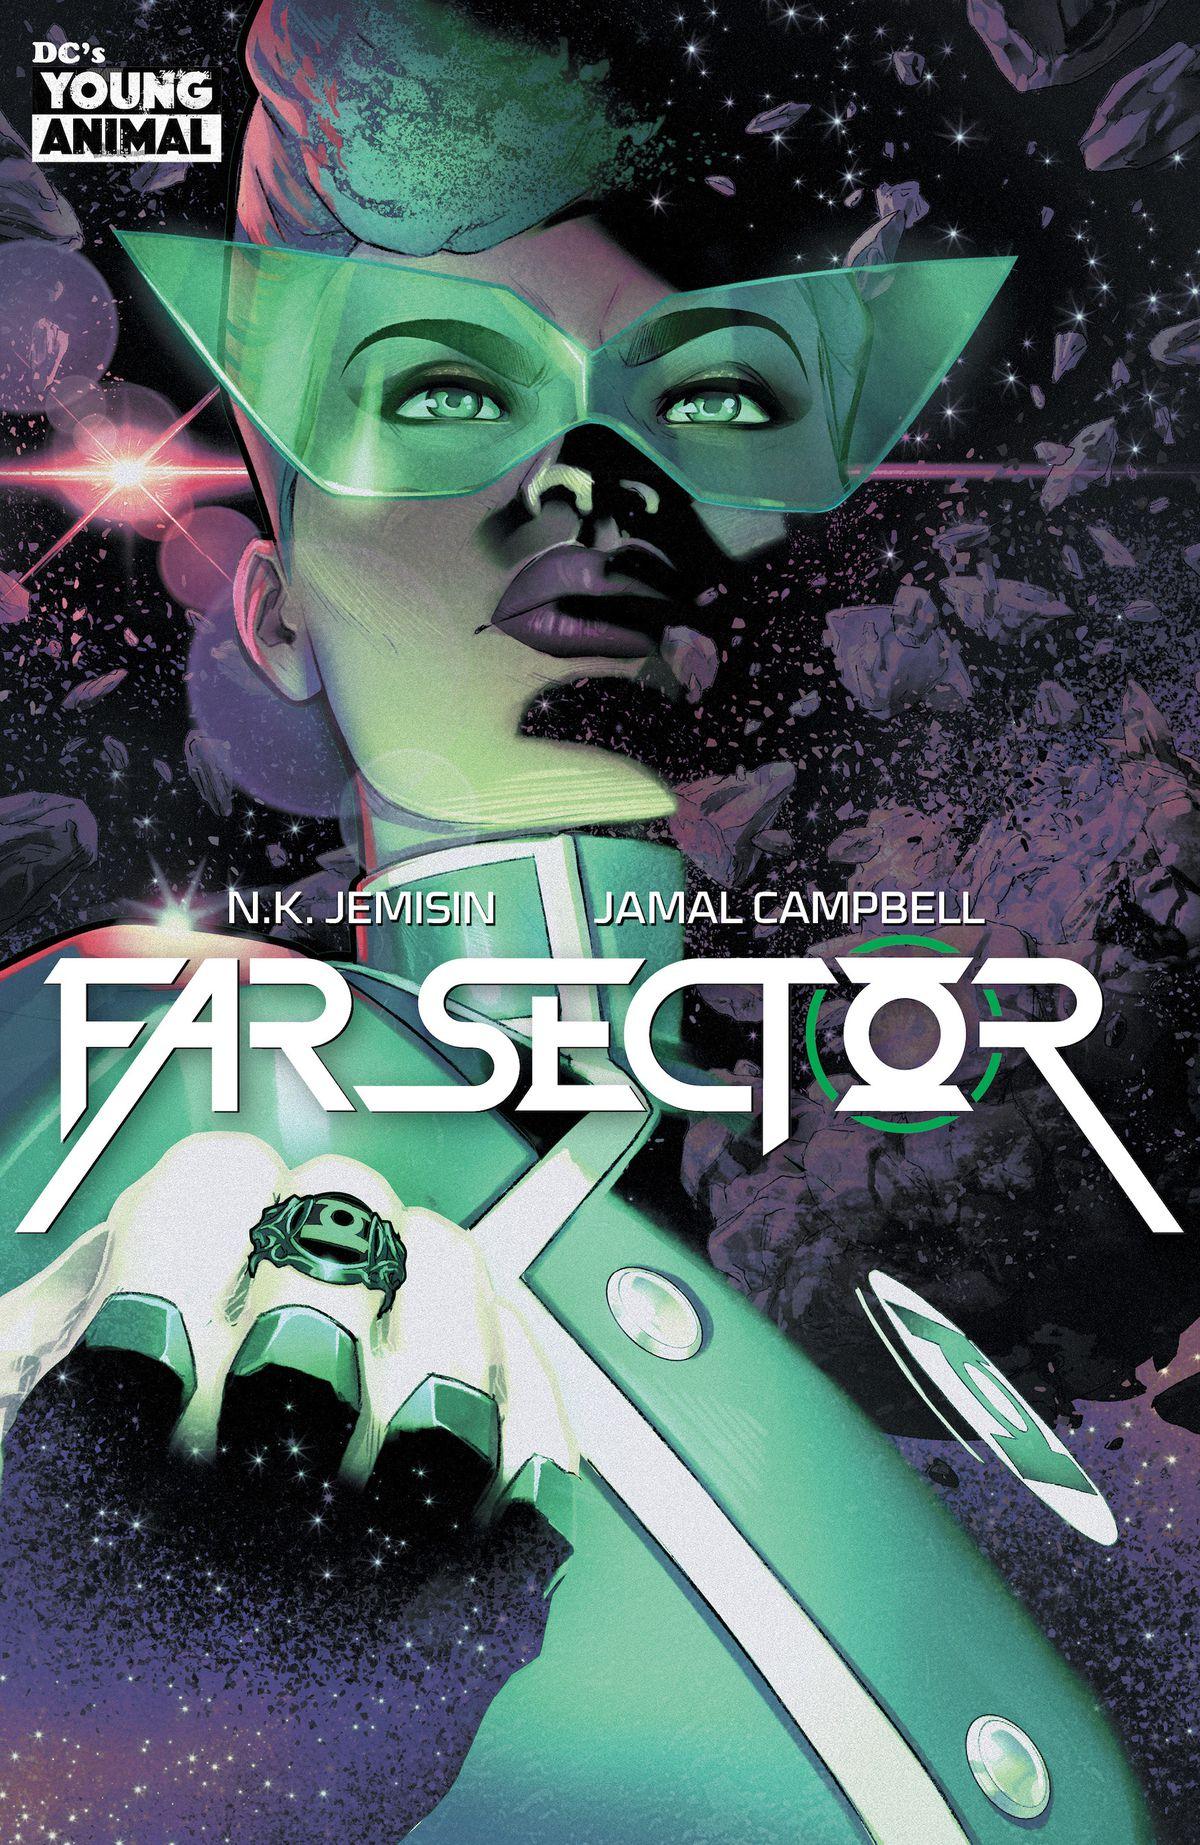 Promo art for Far Sector, DC Comics (2019).